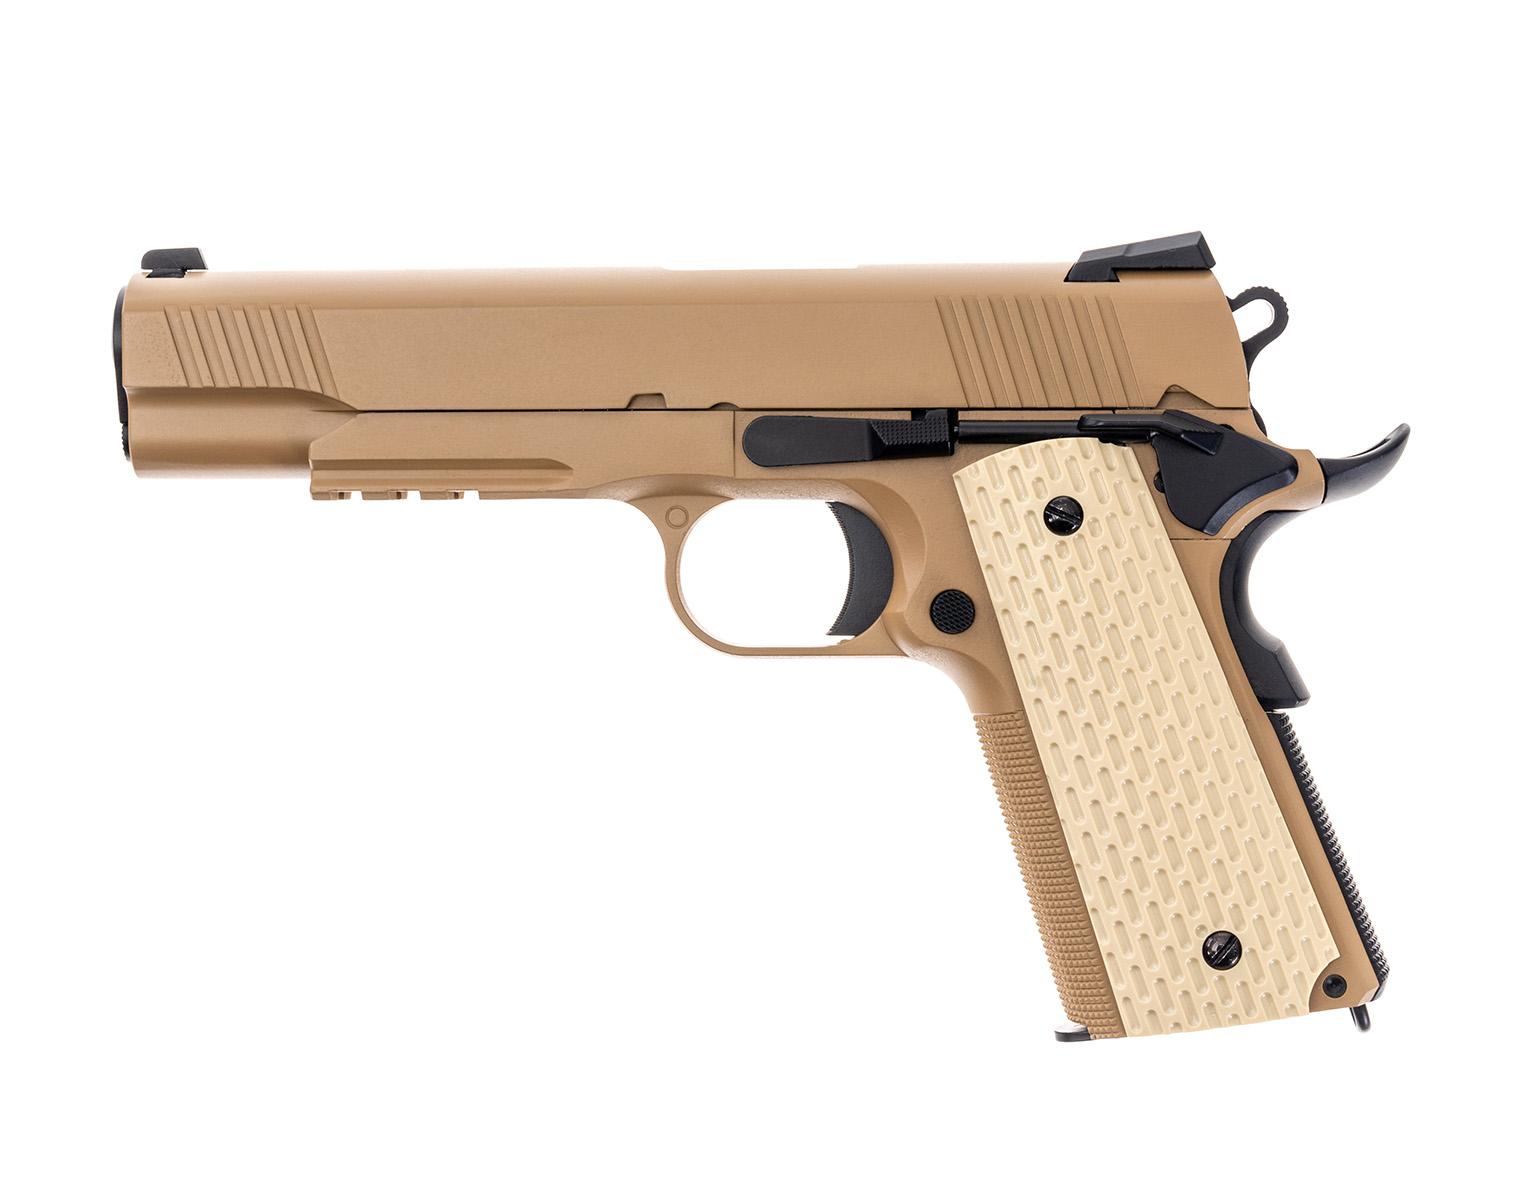 Pištoľ GBB SME 1911 Kimber tan